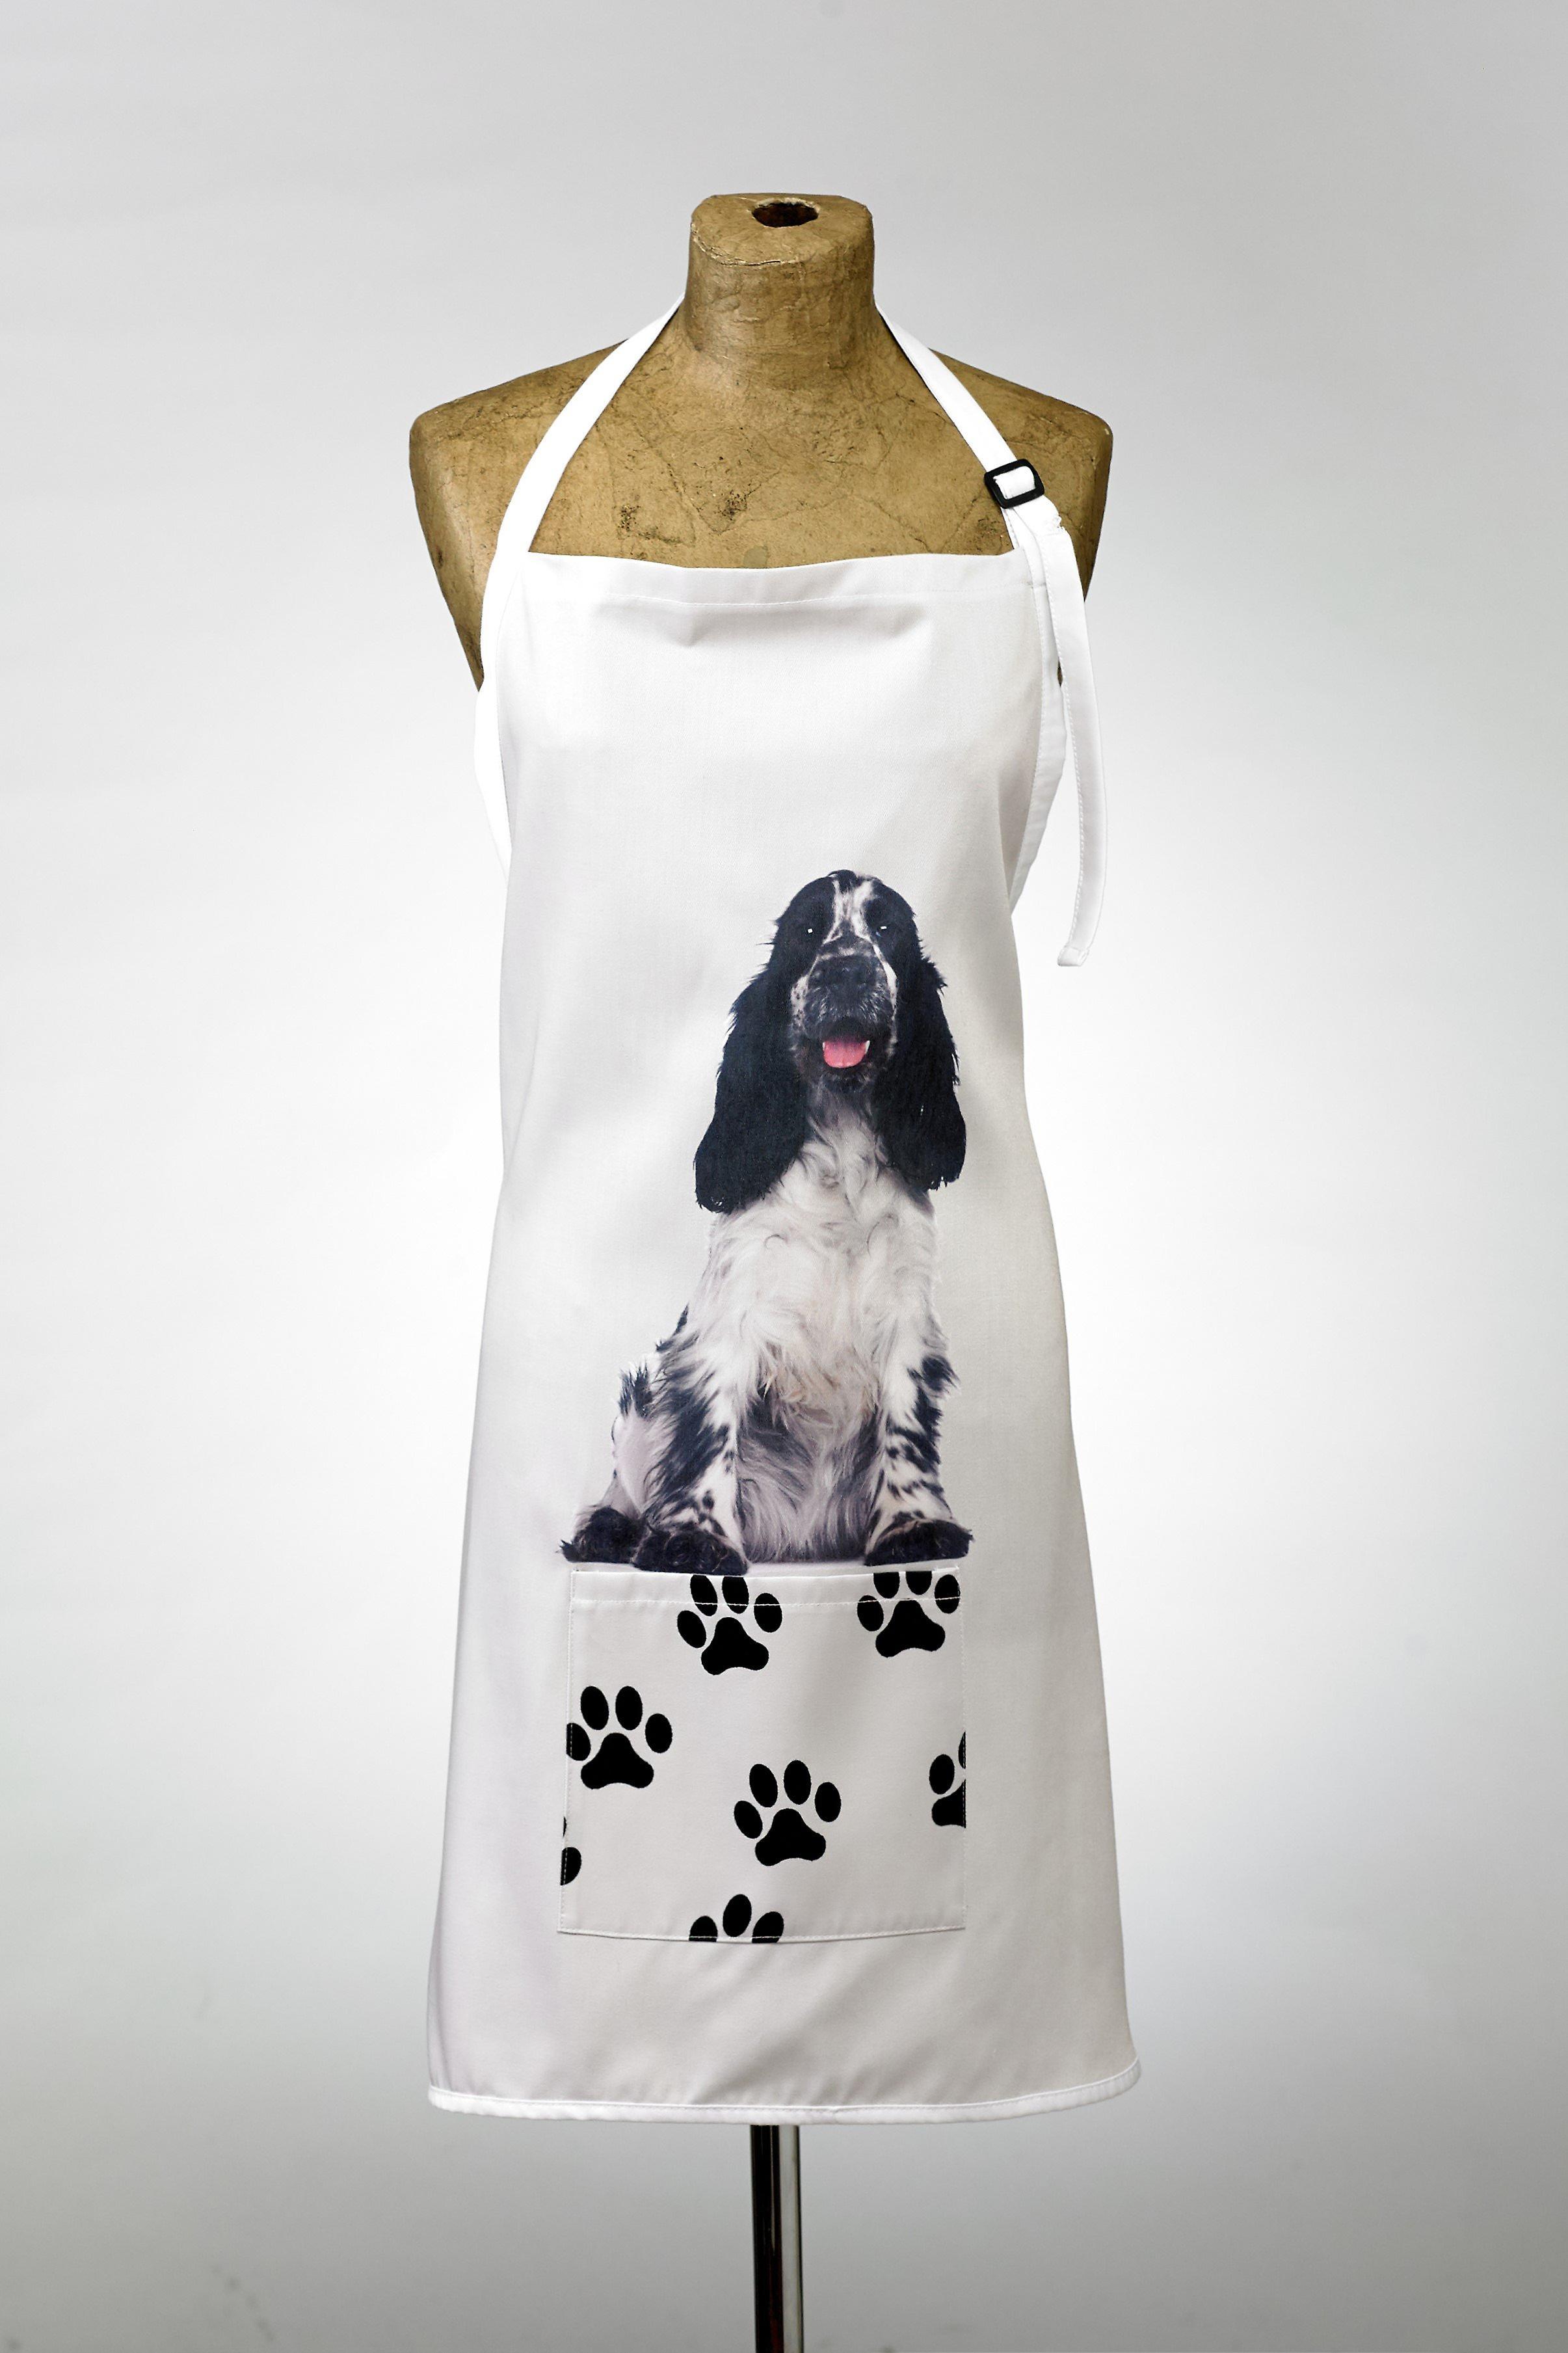 Adorable black & white cocker spaniel design apron